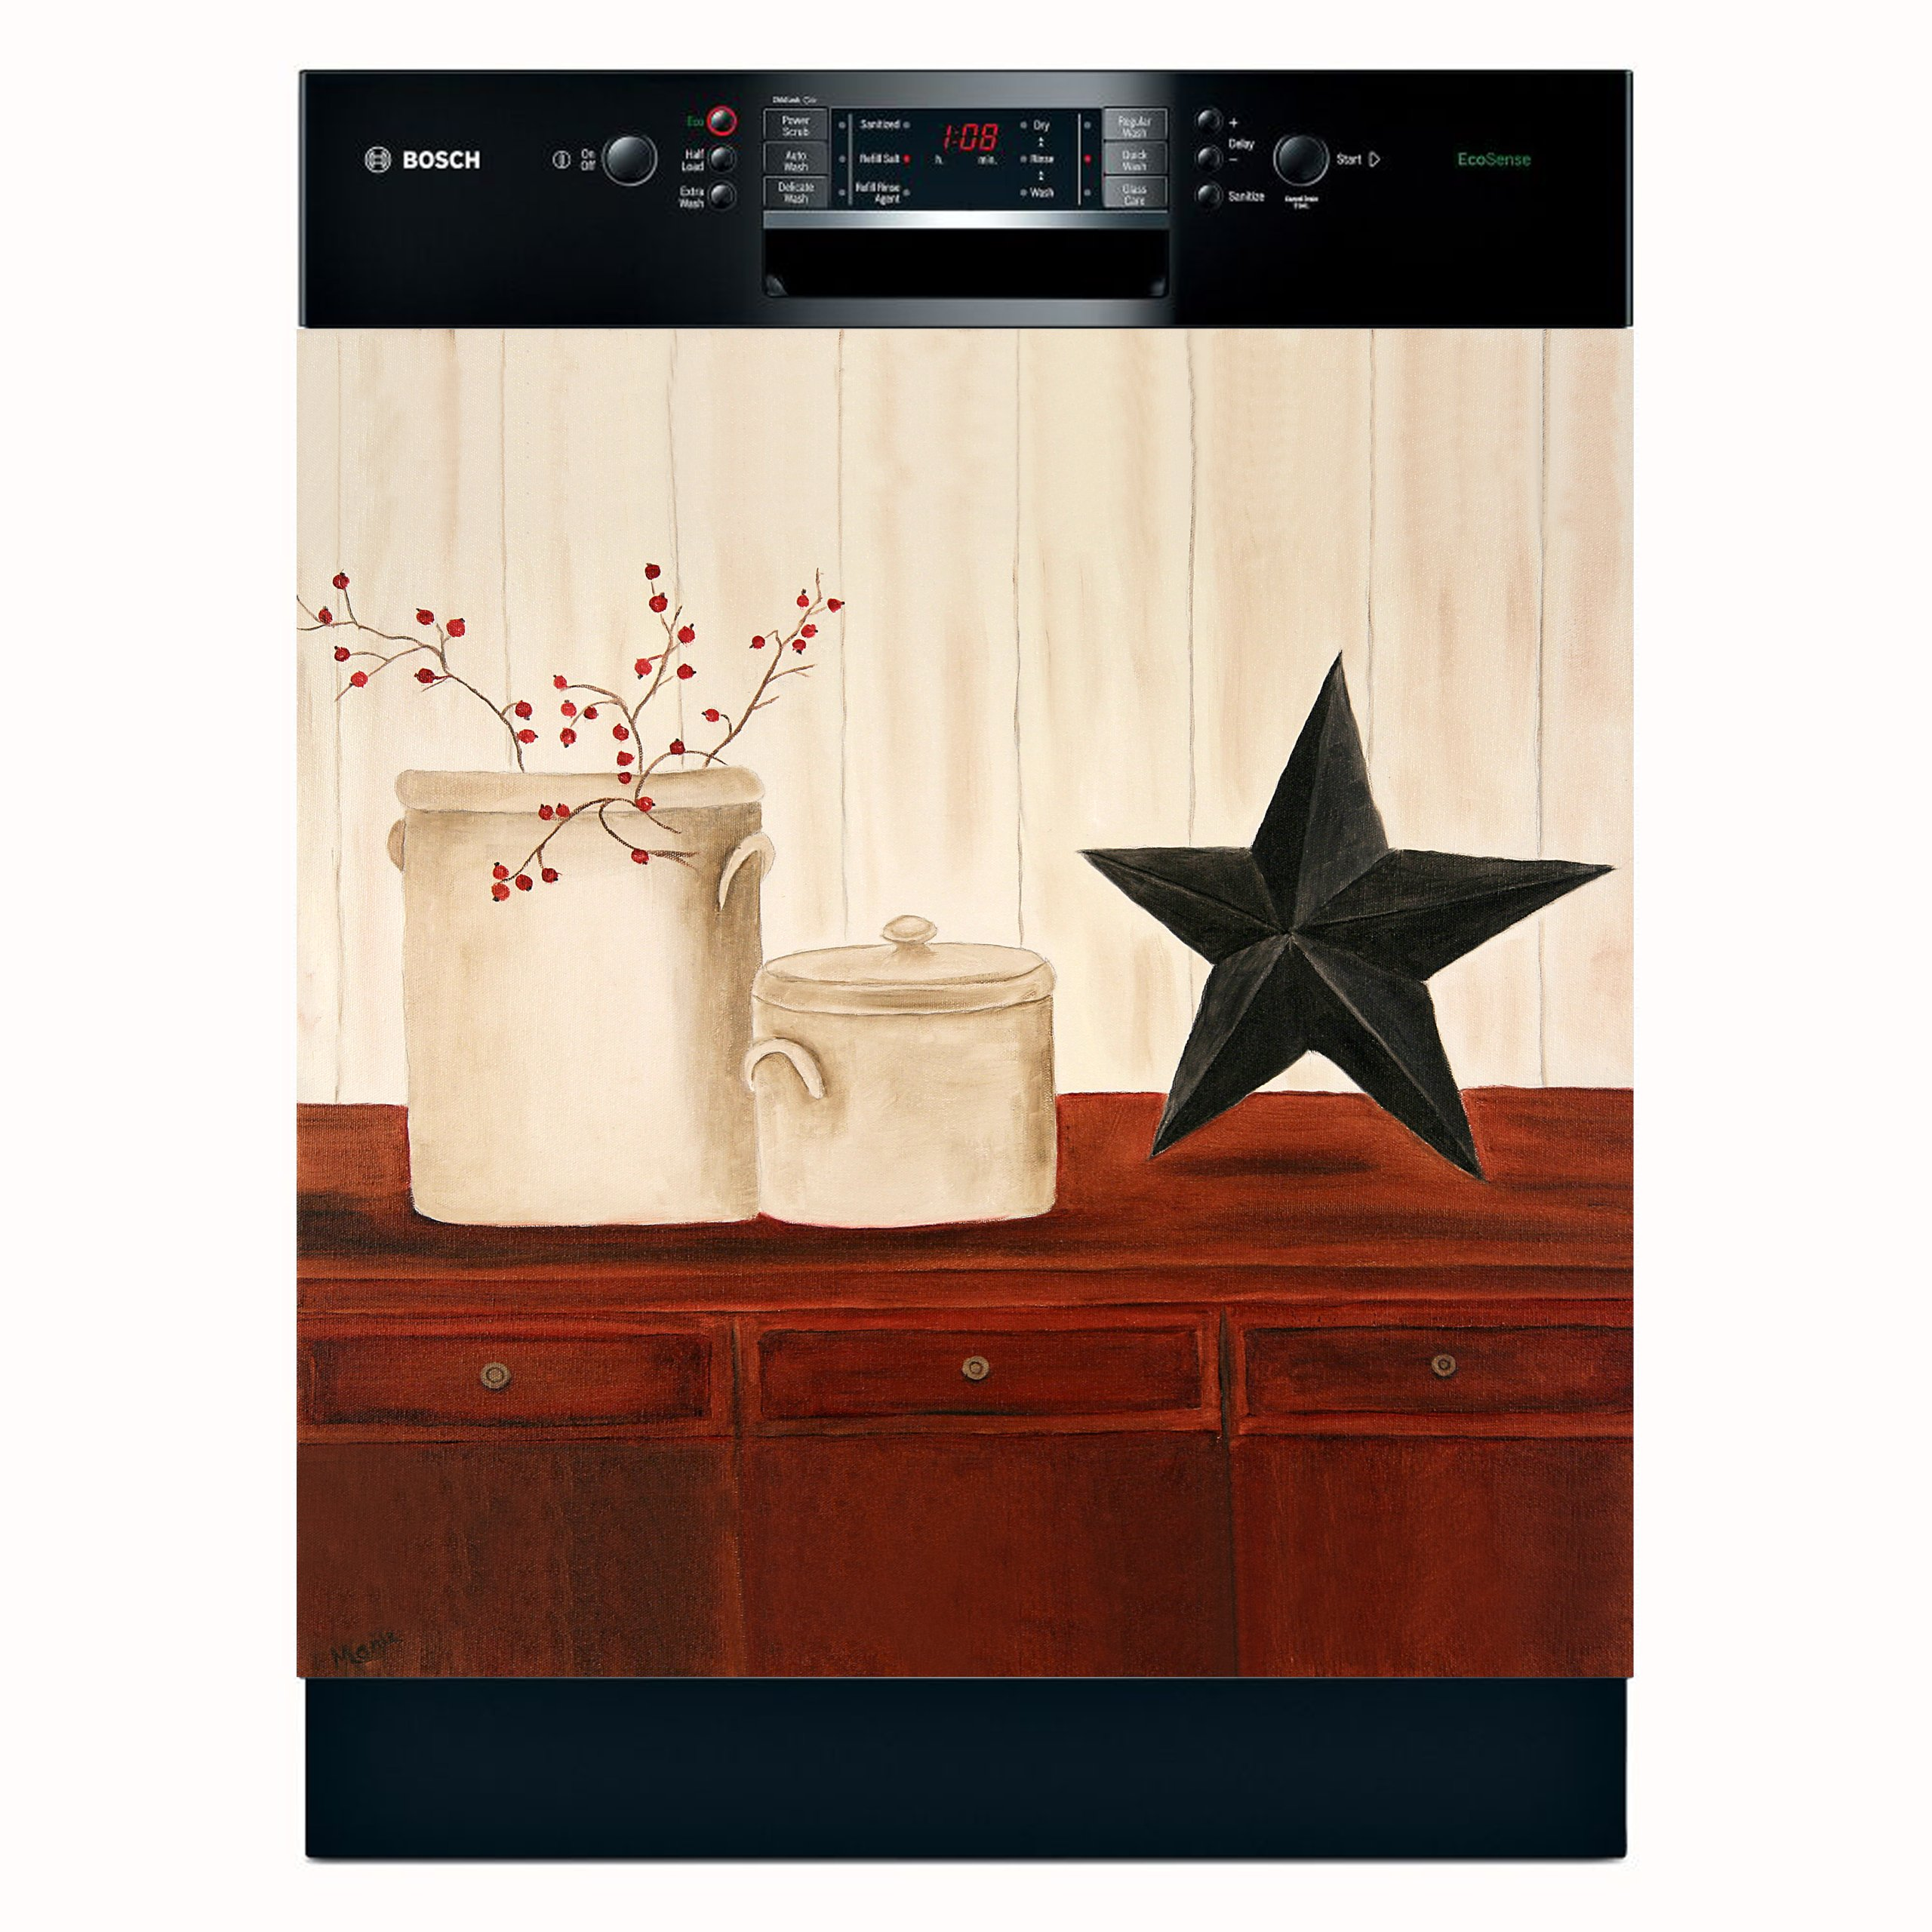 Crocks & Star Dishwasher Magnet Cover (Large) by Appliance Art